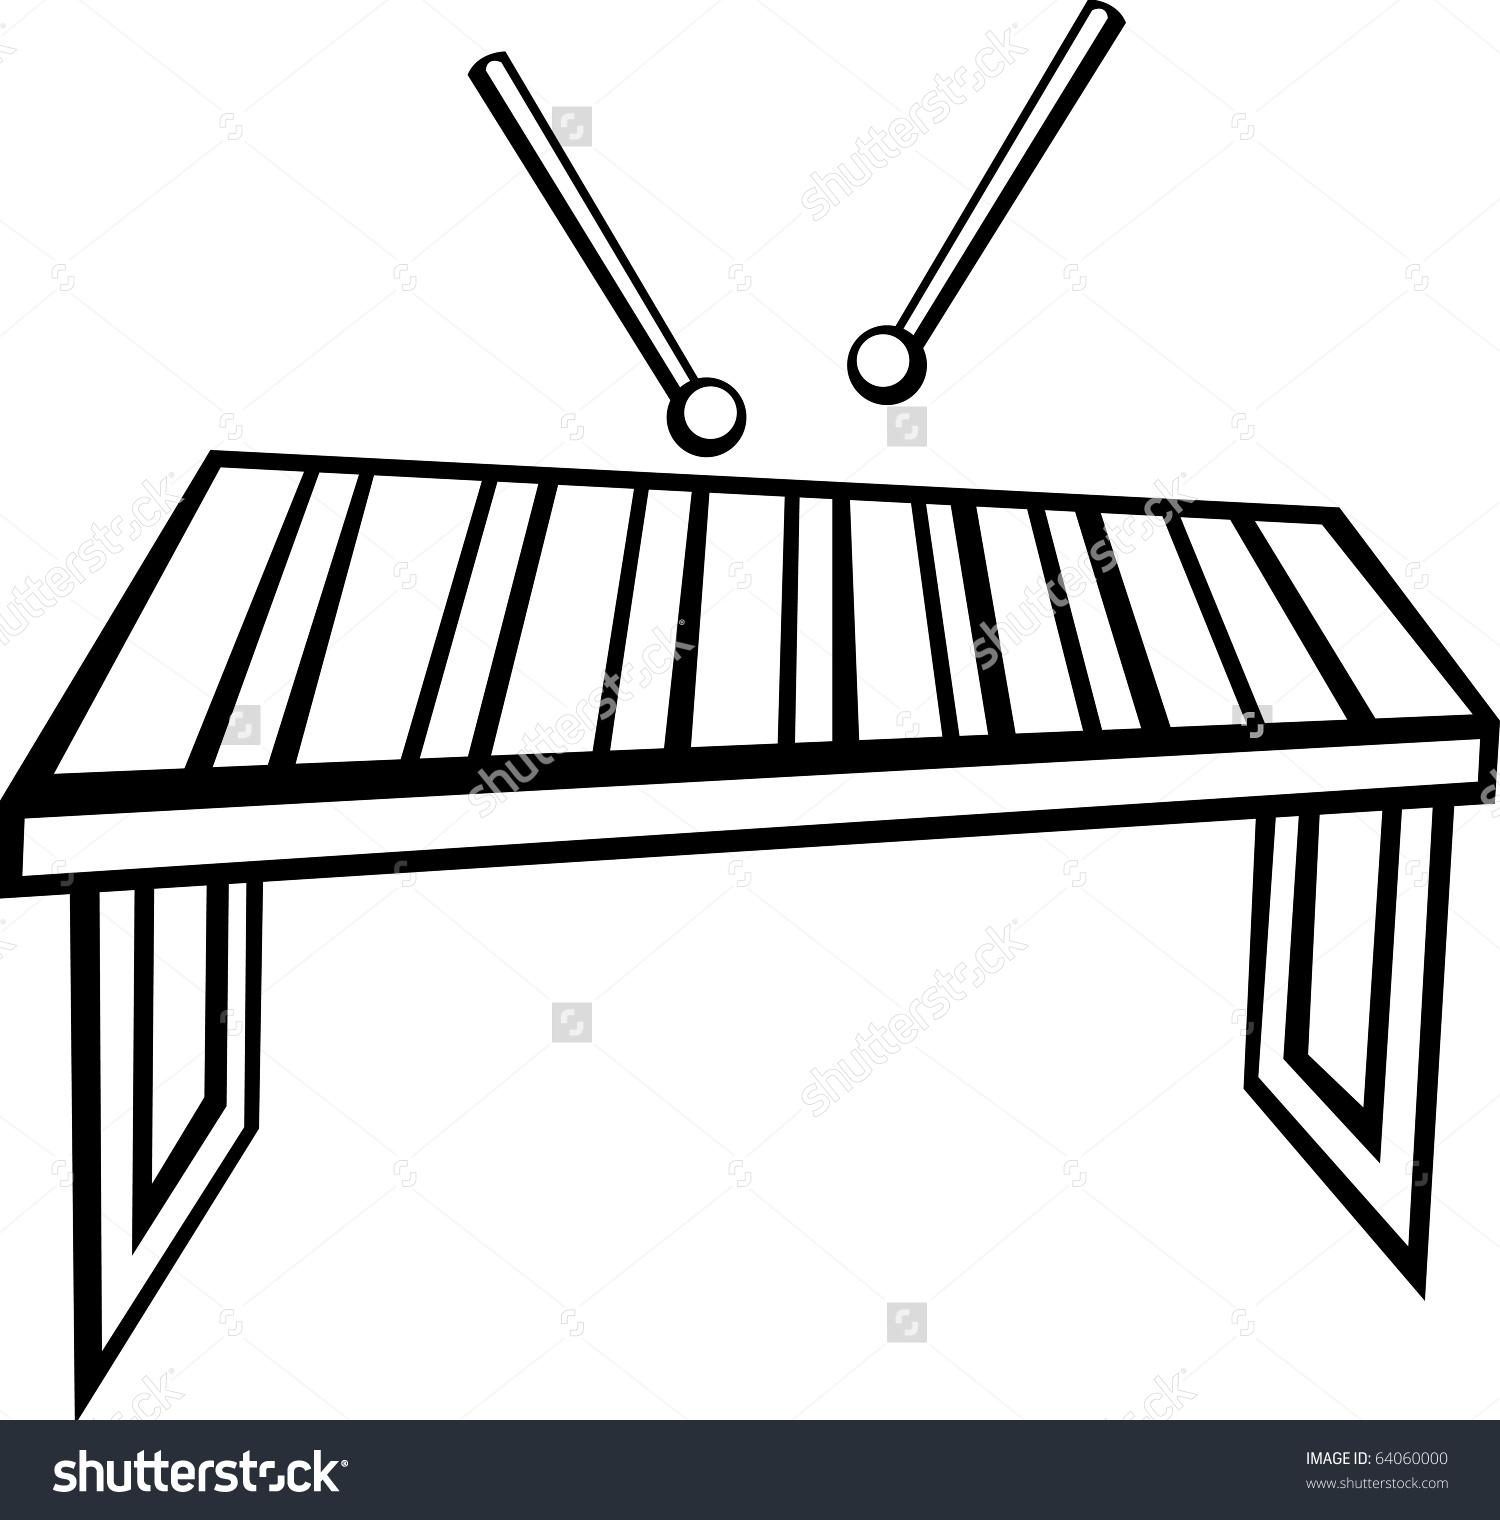 Xylophone Vibraphone Marimba Musical Instrument Stock Illustration.